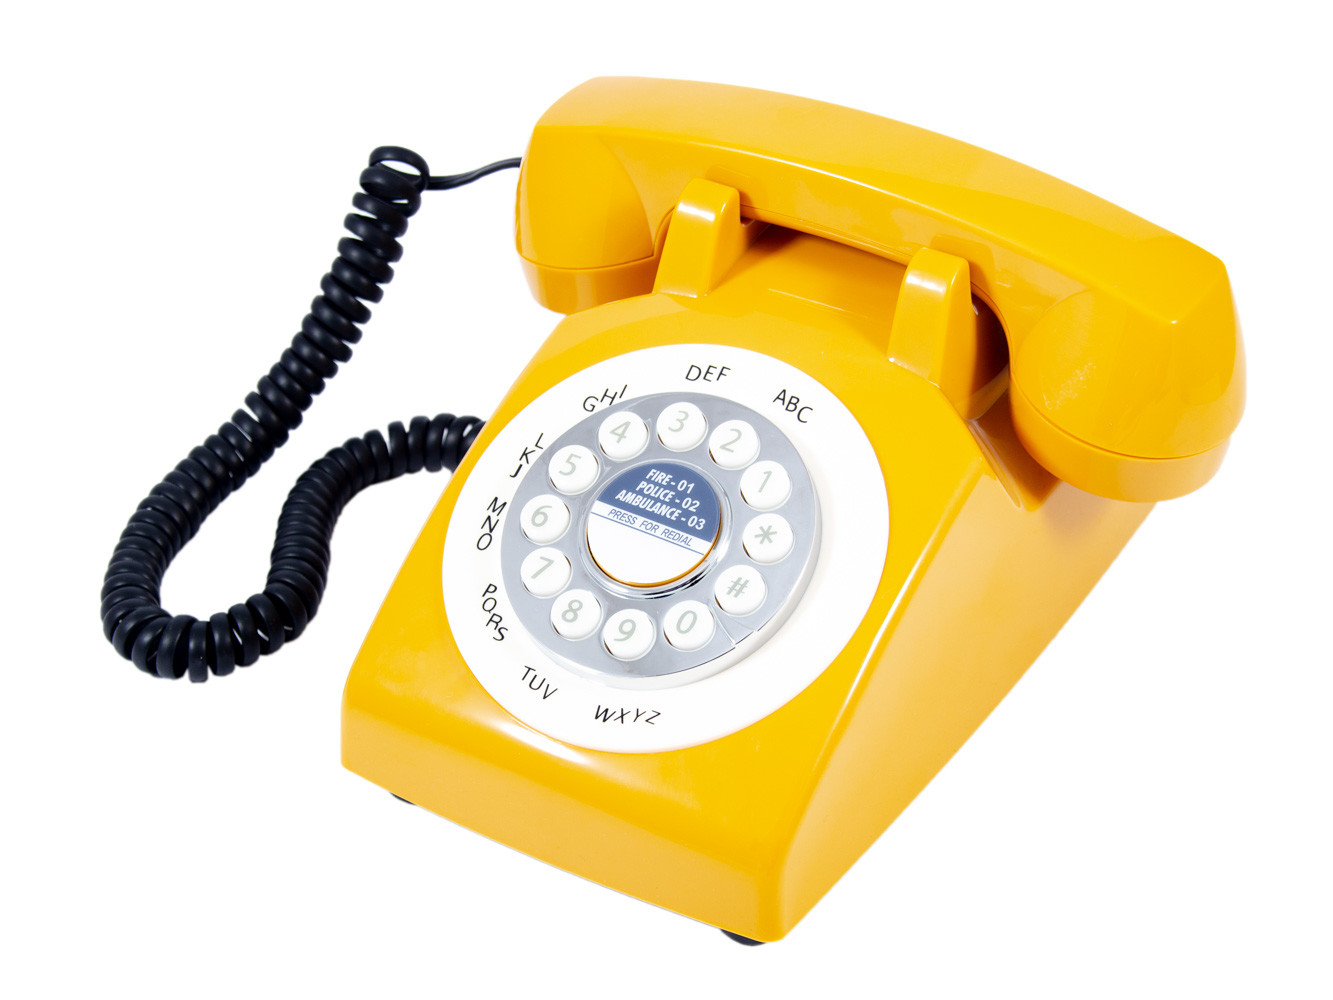 Телефон-ретро, 25x30x13 см, артикул 98909